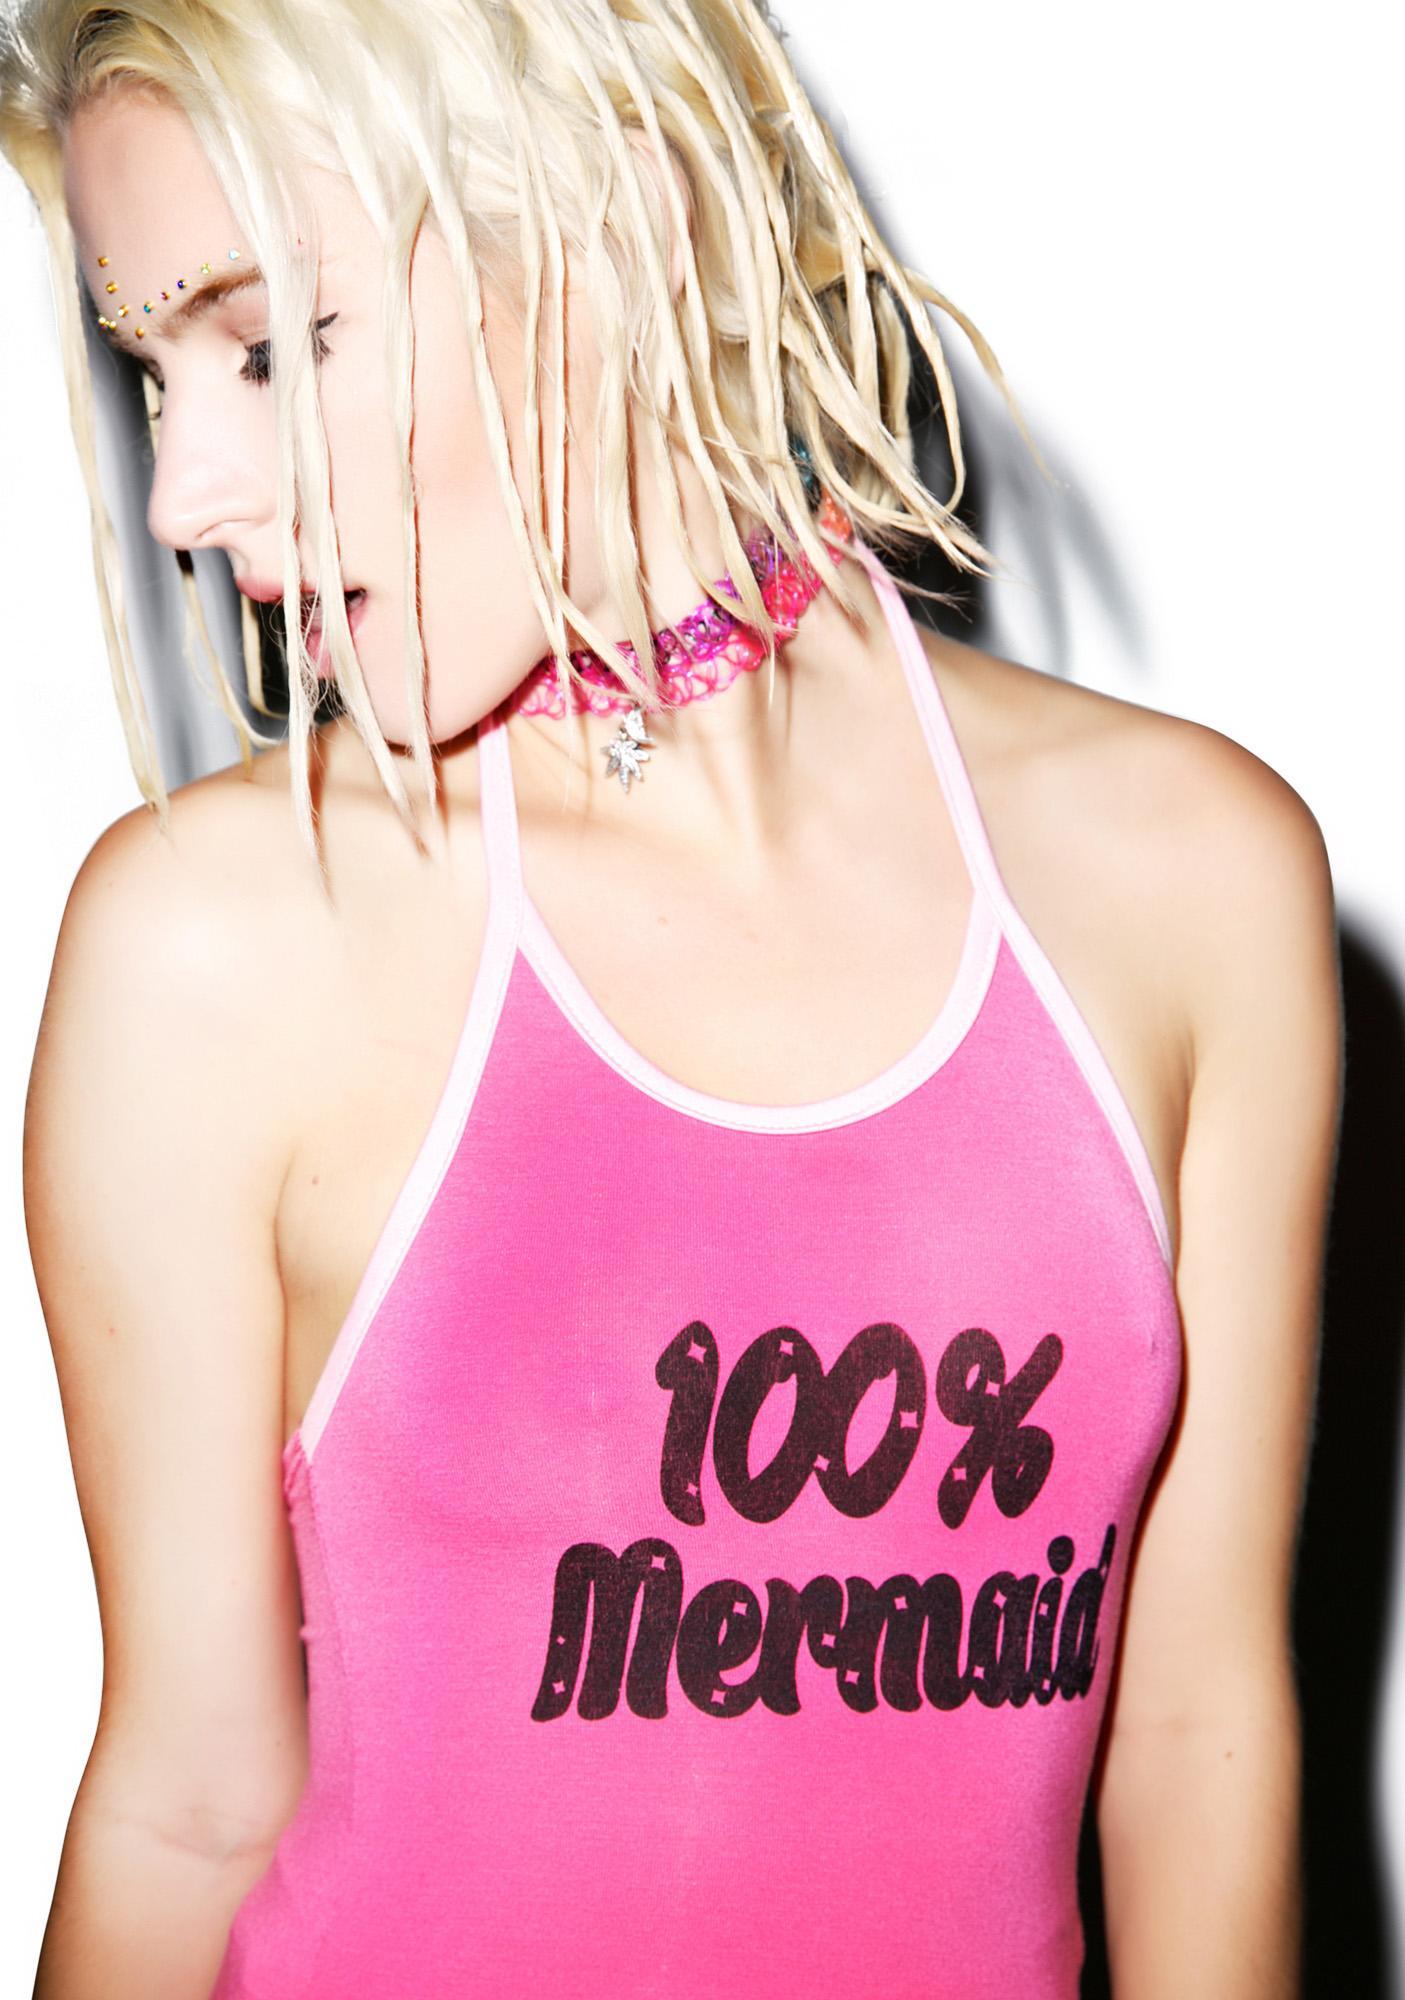 O Mighty Total Mermaid Halter Top